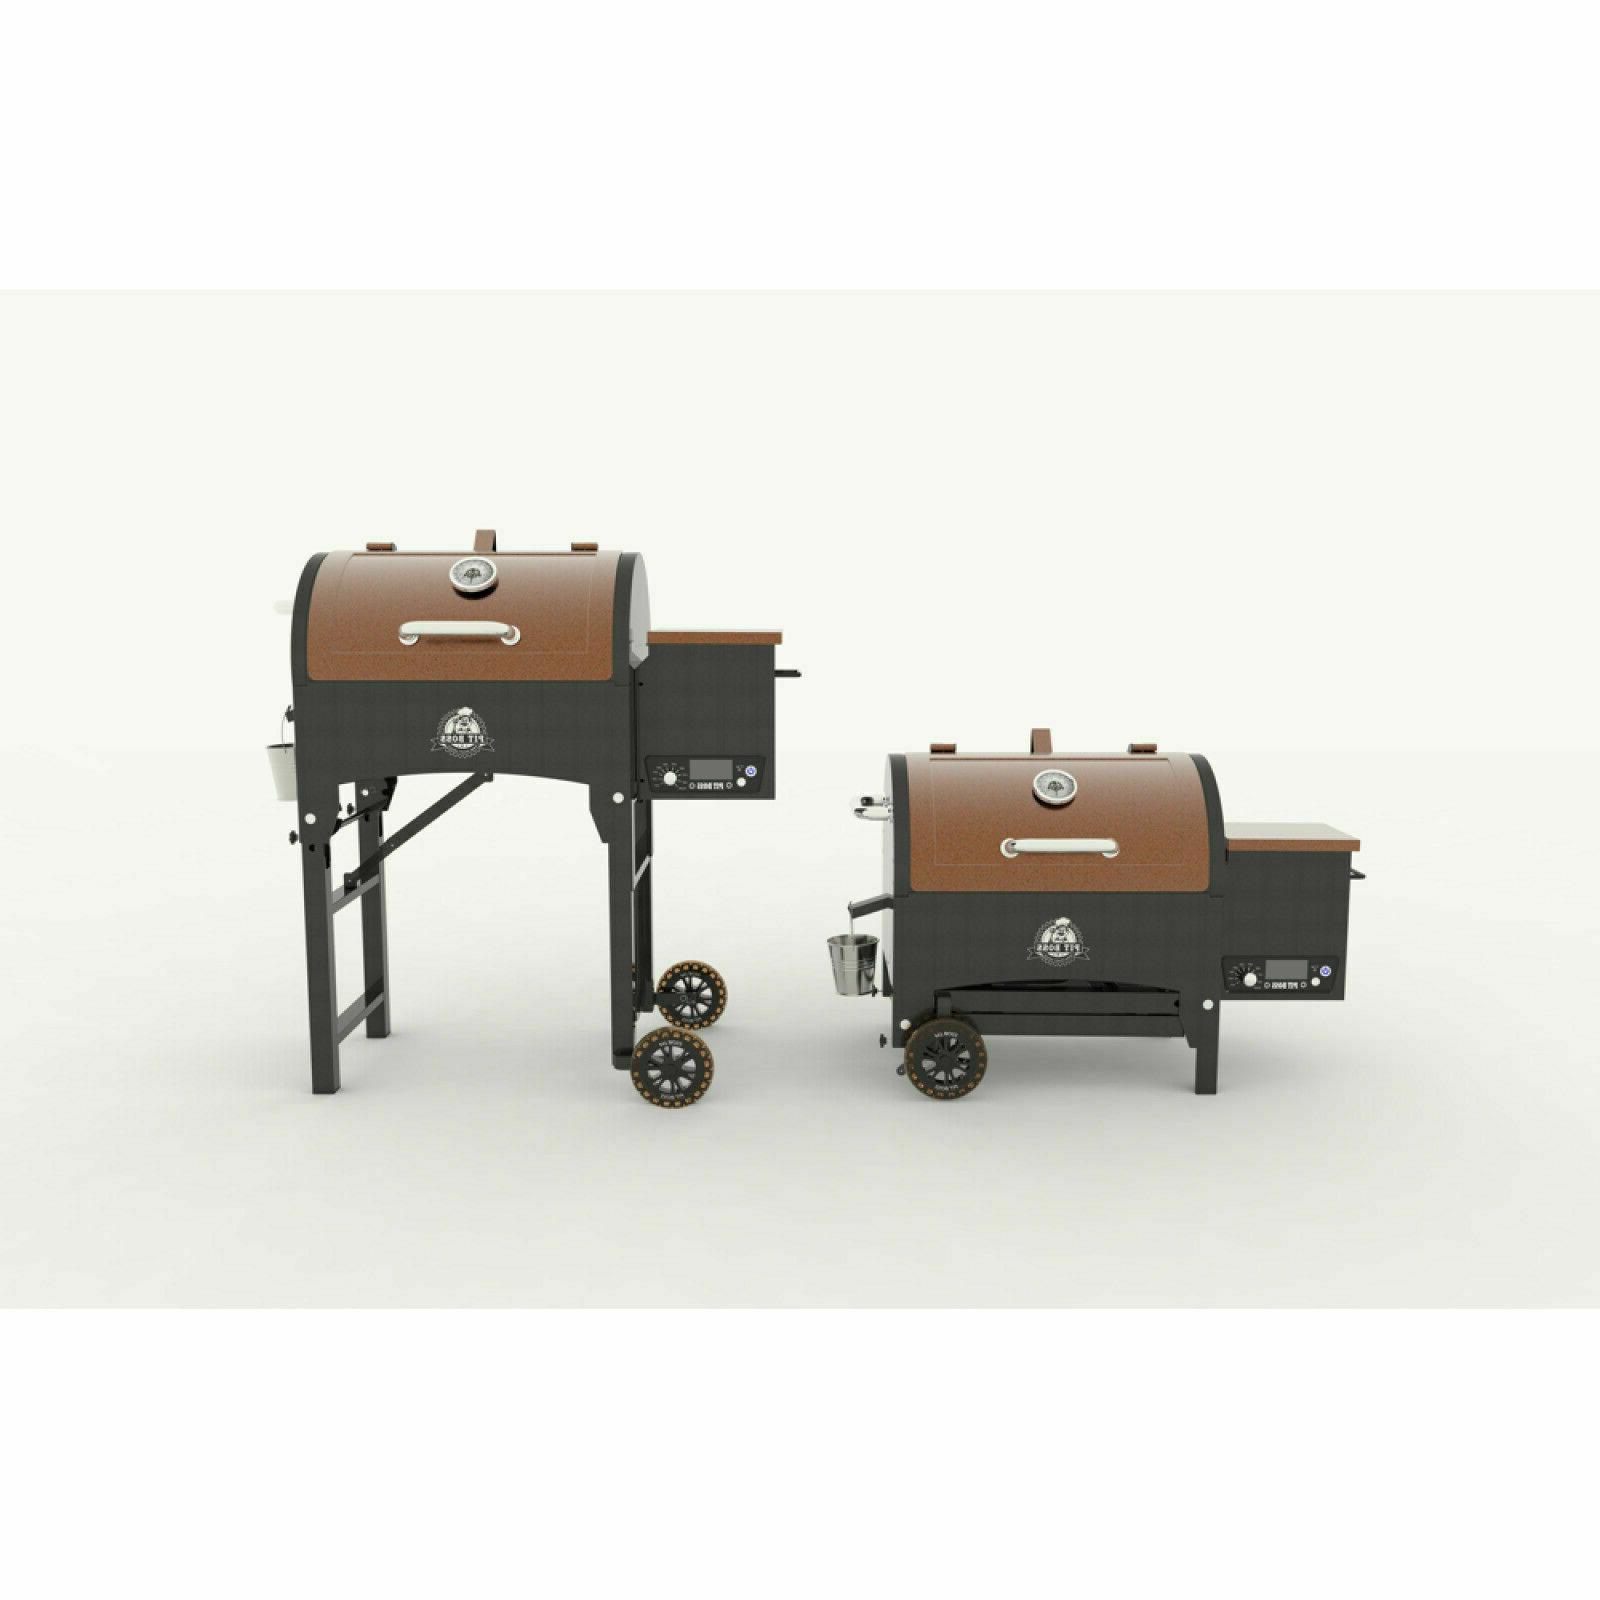 Pit Boss Portable Tailgate/Camp Pellet Grill W/ Folding Legs